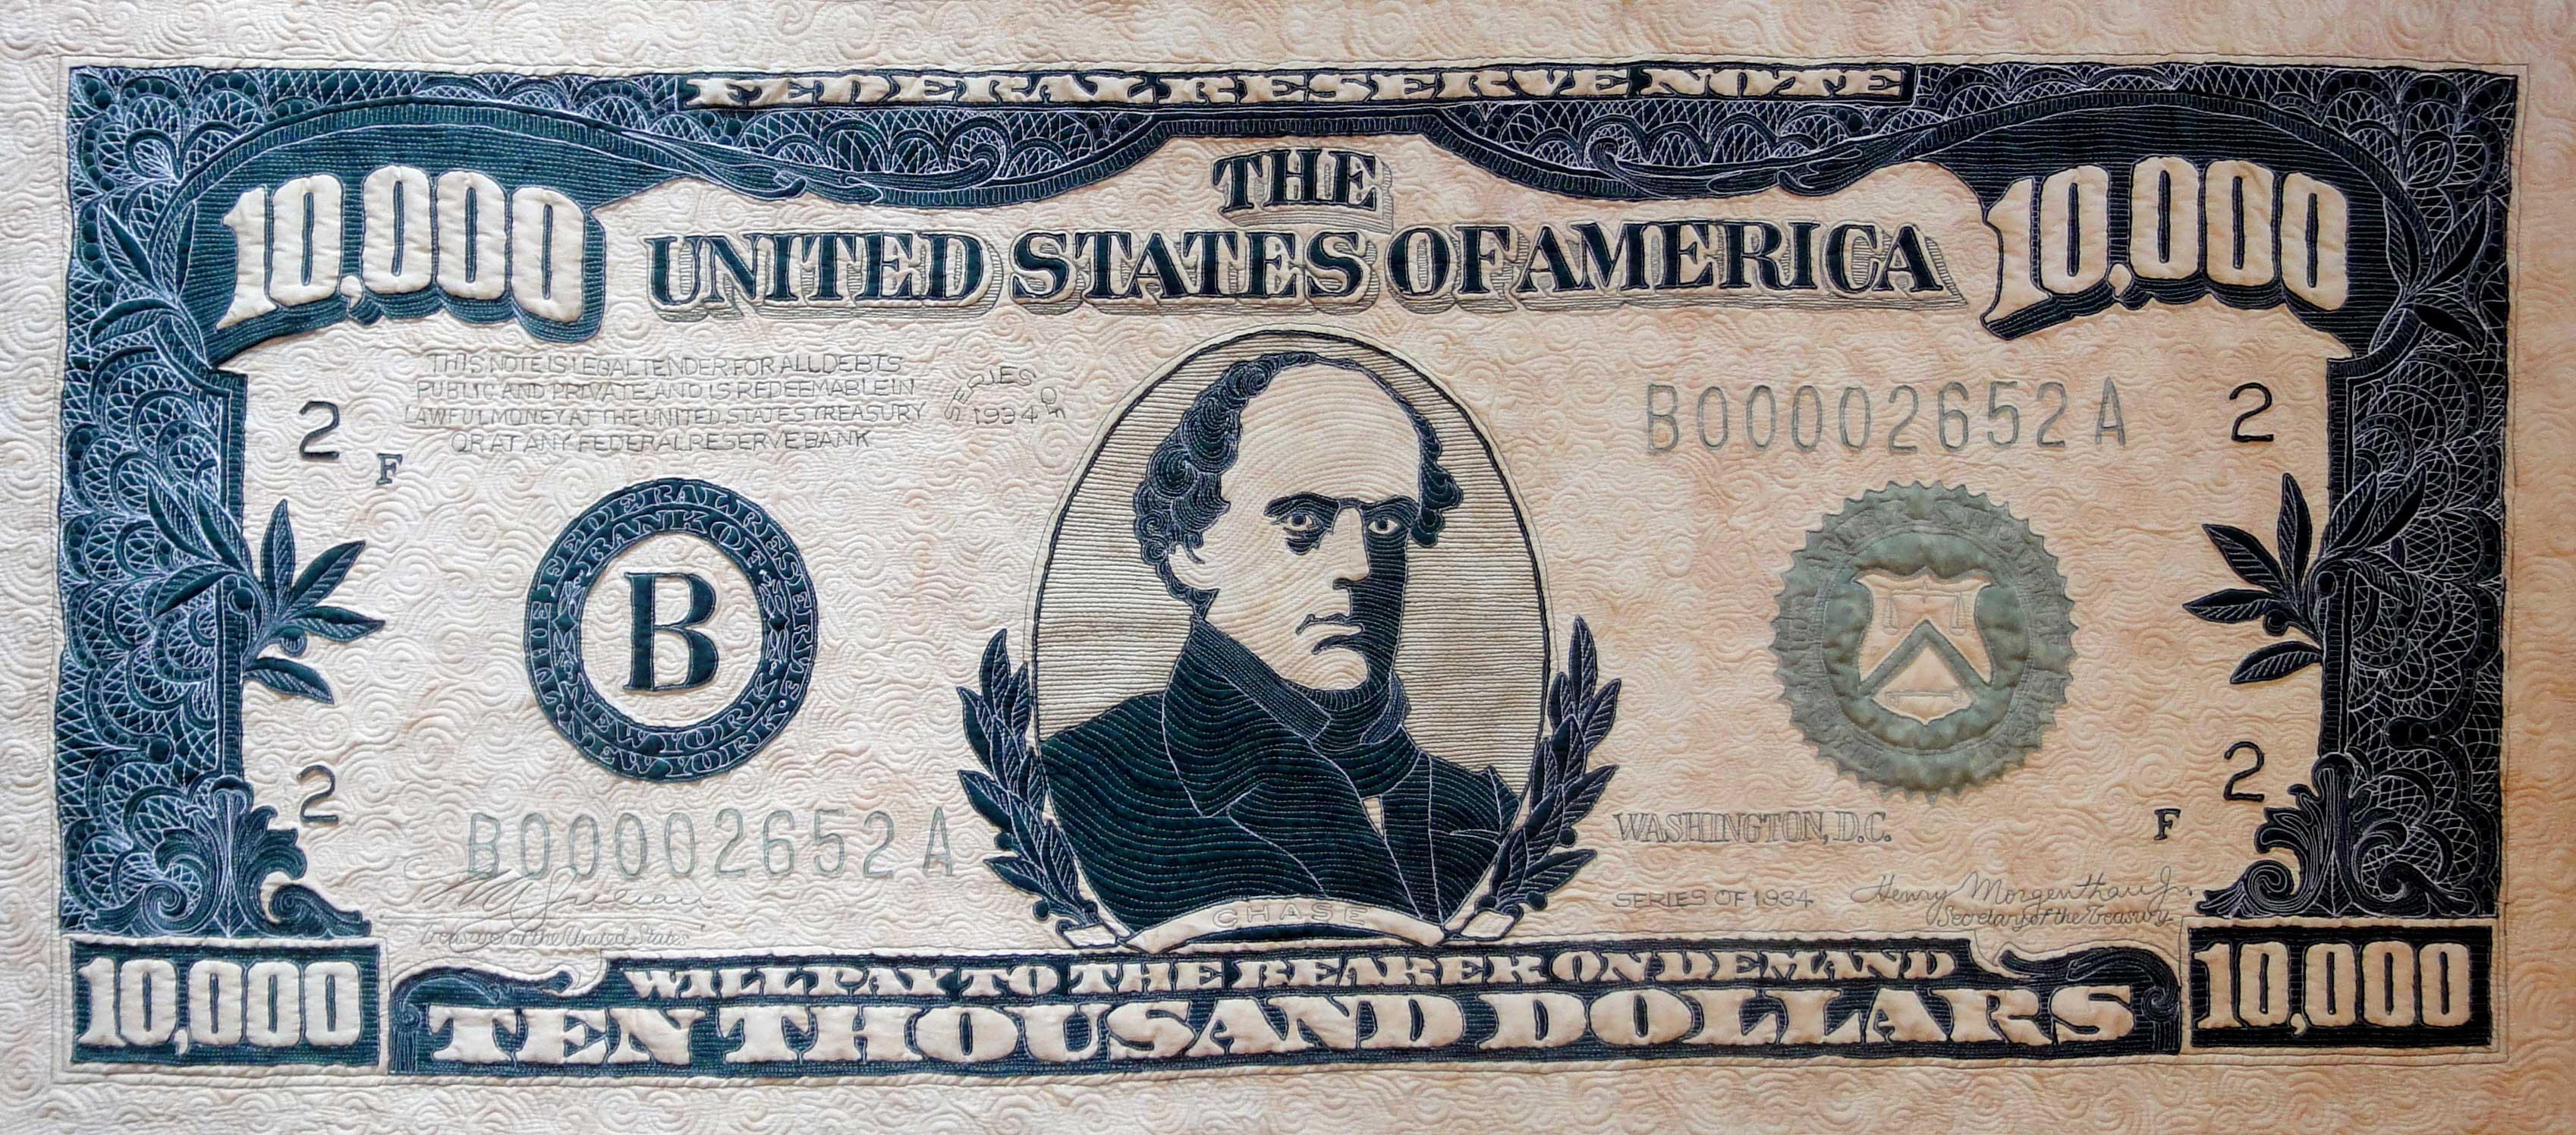 10 thousand us dollars